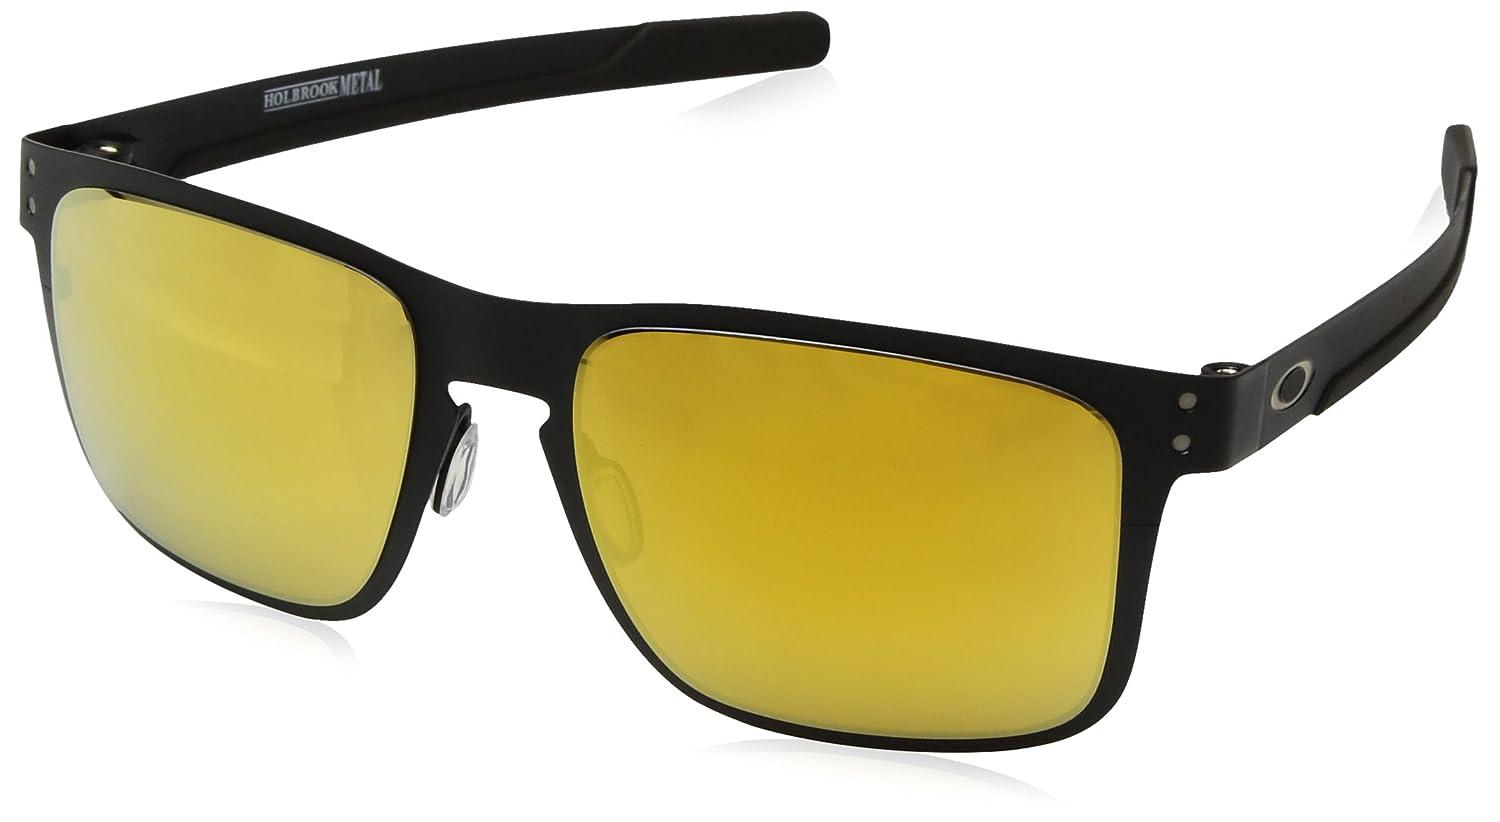 1ae4db612c7c8 Amazon.com  Oakley Men s Holbrook Metal Non-Polarized Iridium Square  Sunglasses MATTE BLACK 55.0 mm  Oakley  Clothing